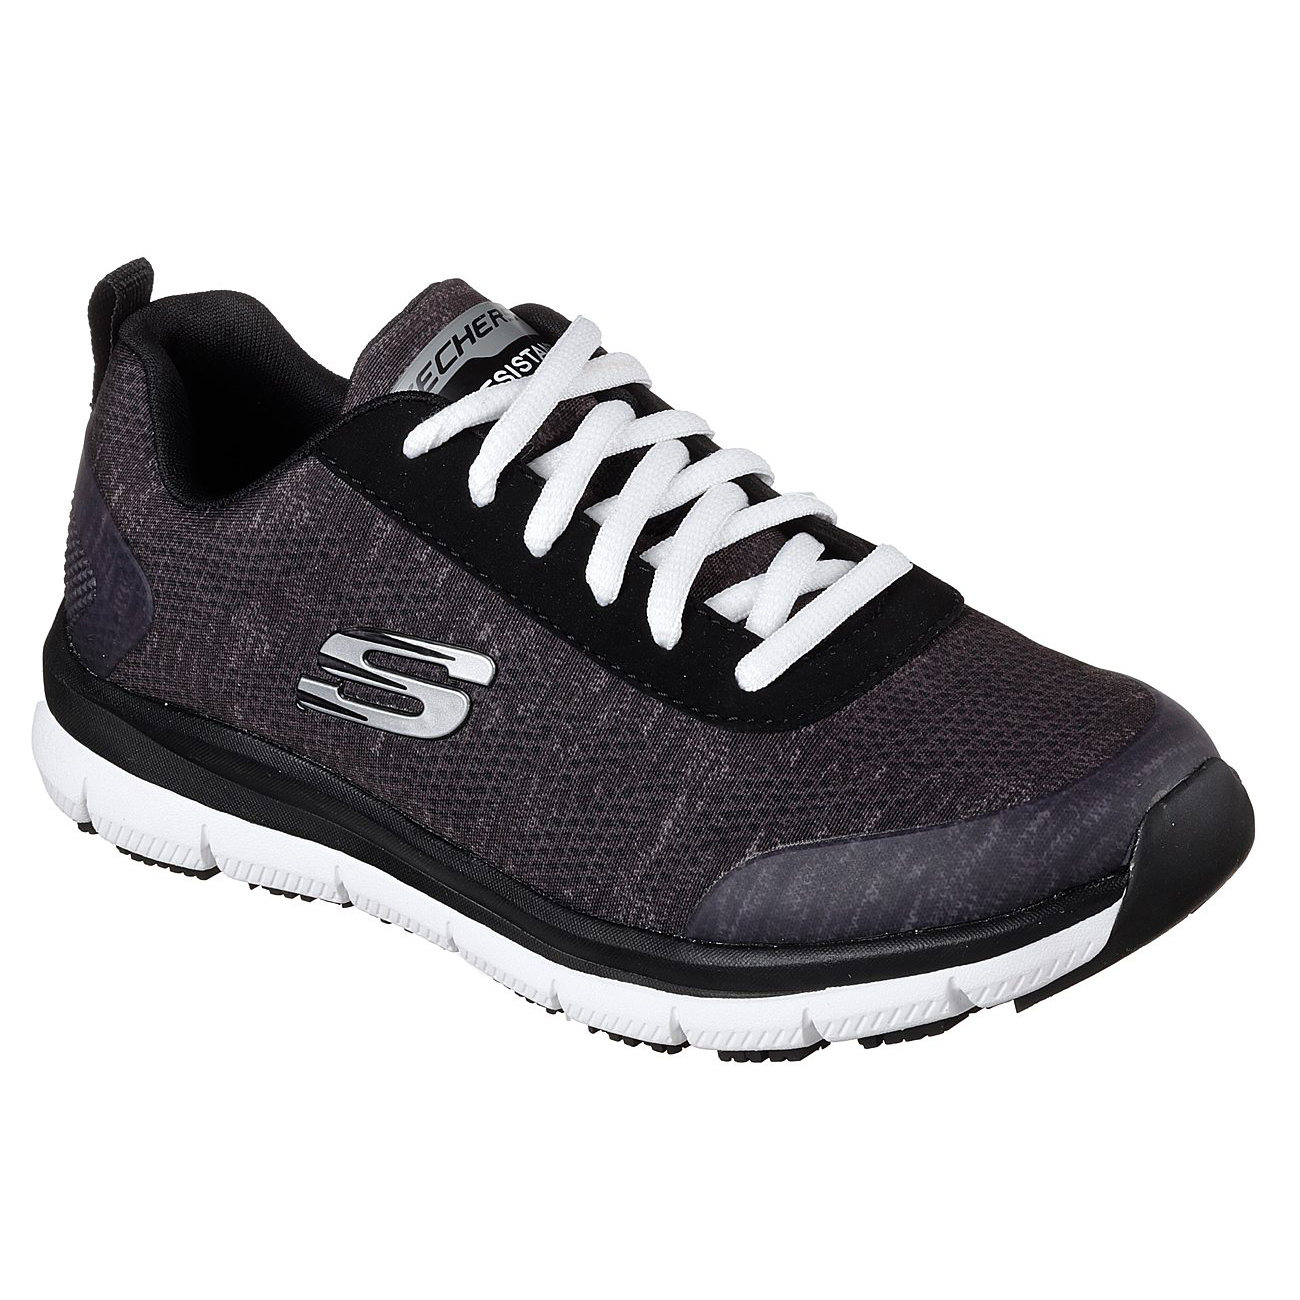 Comfort Flex Pro Health Care SR Shoe